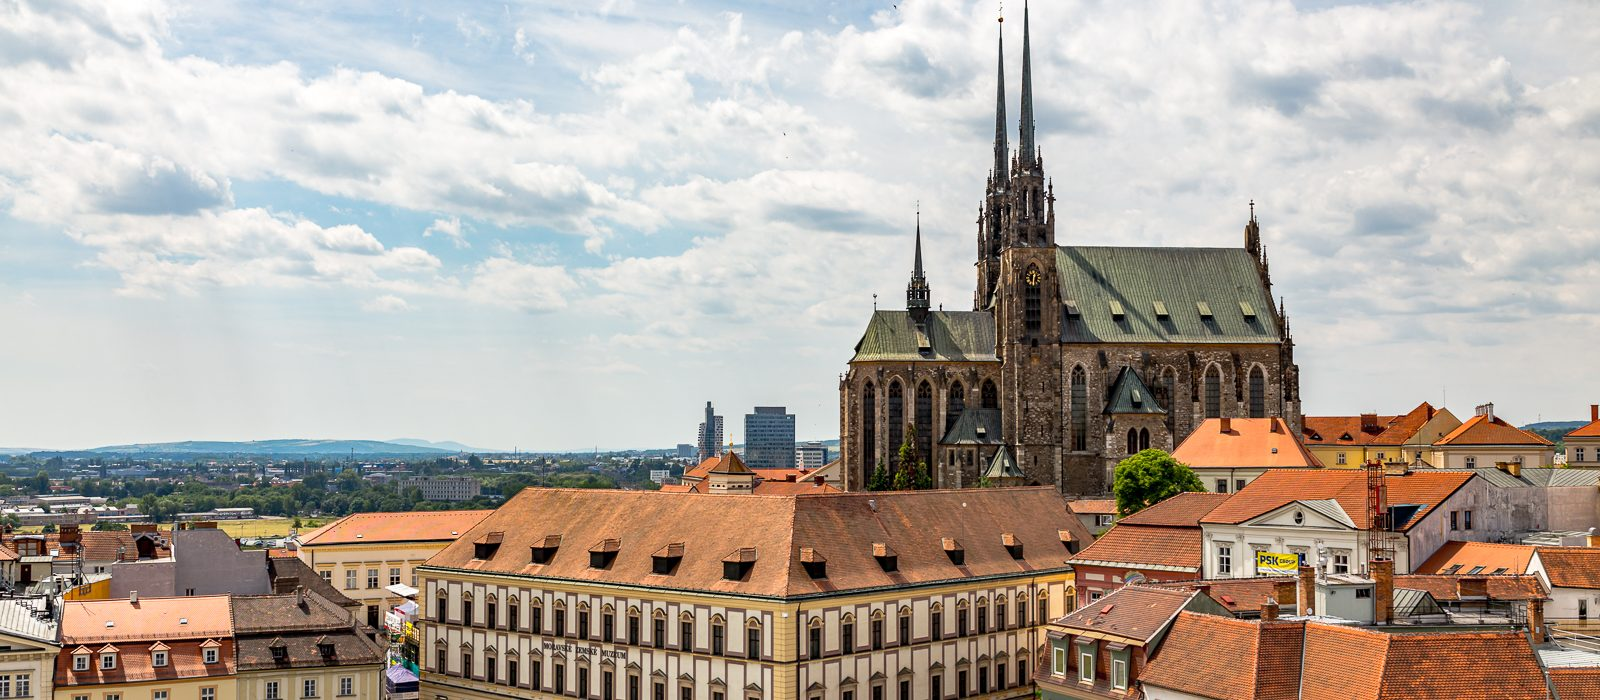 Kathedrale St. Peter und Paul Brünn